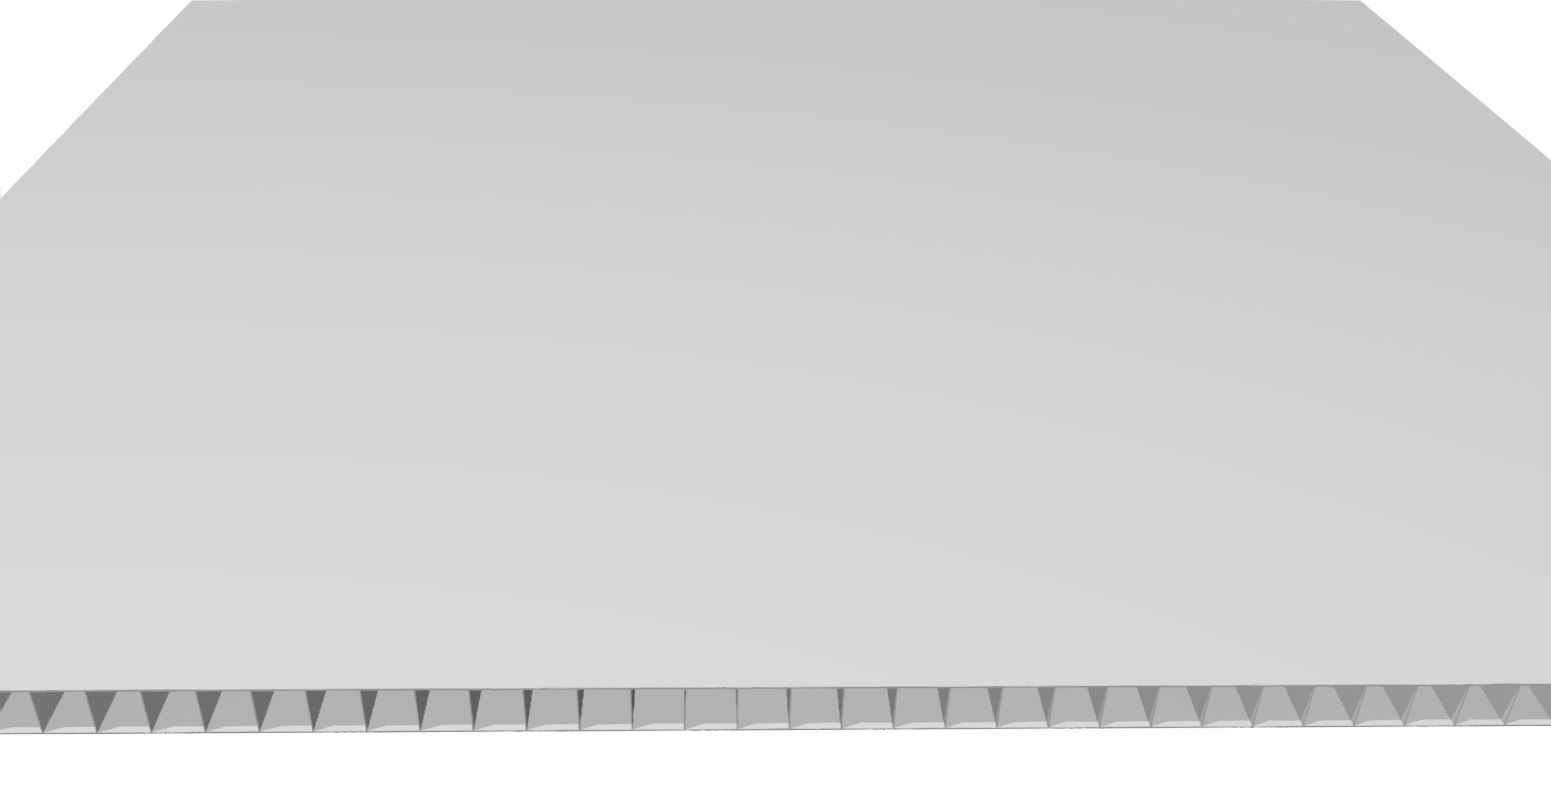 Stegplatte 4,5 mm PP, weiß